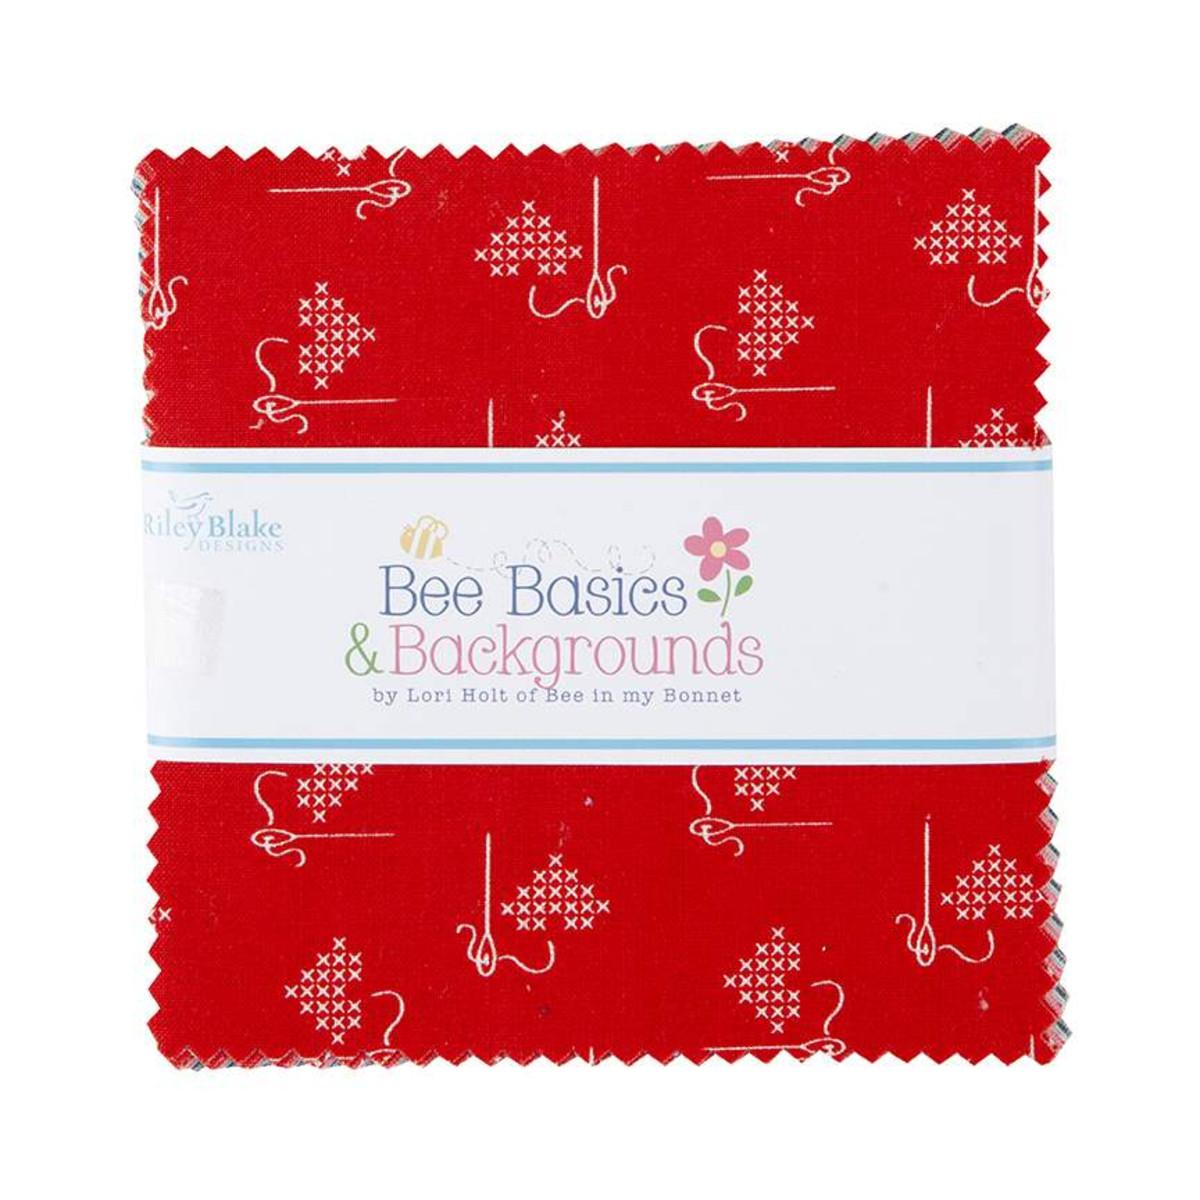 Riley Blake Charm Pack - Bee Basics RED by Lori Holt